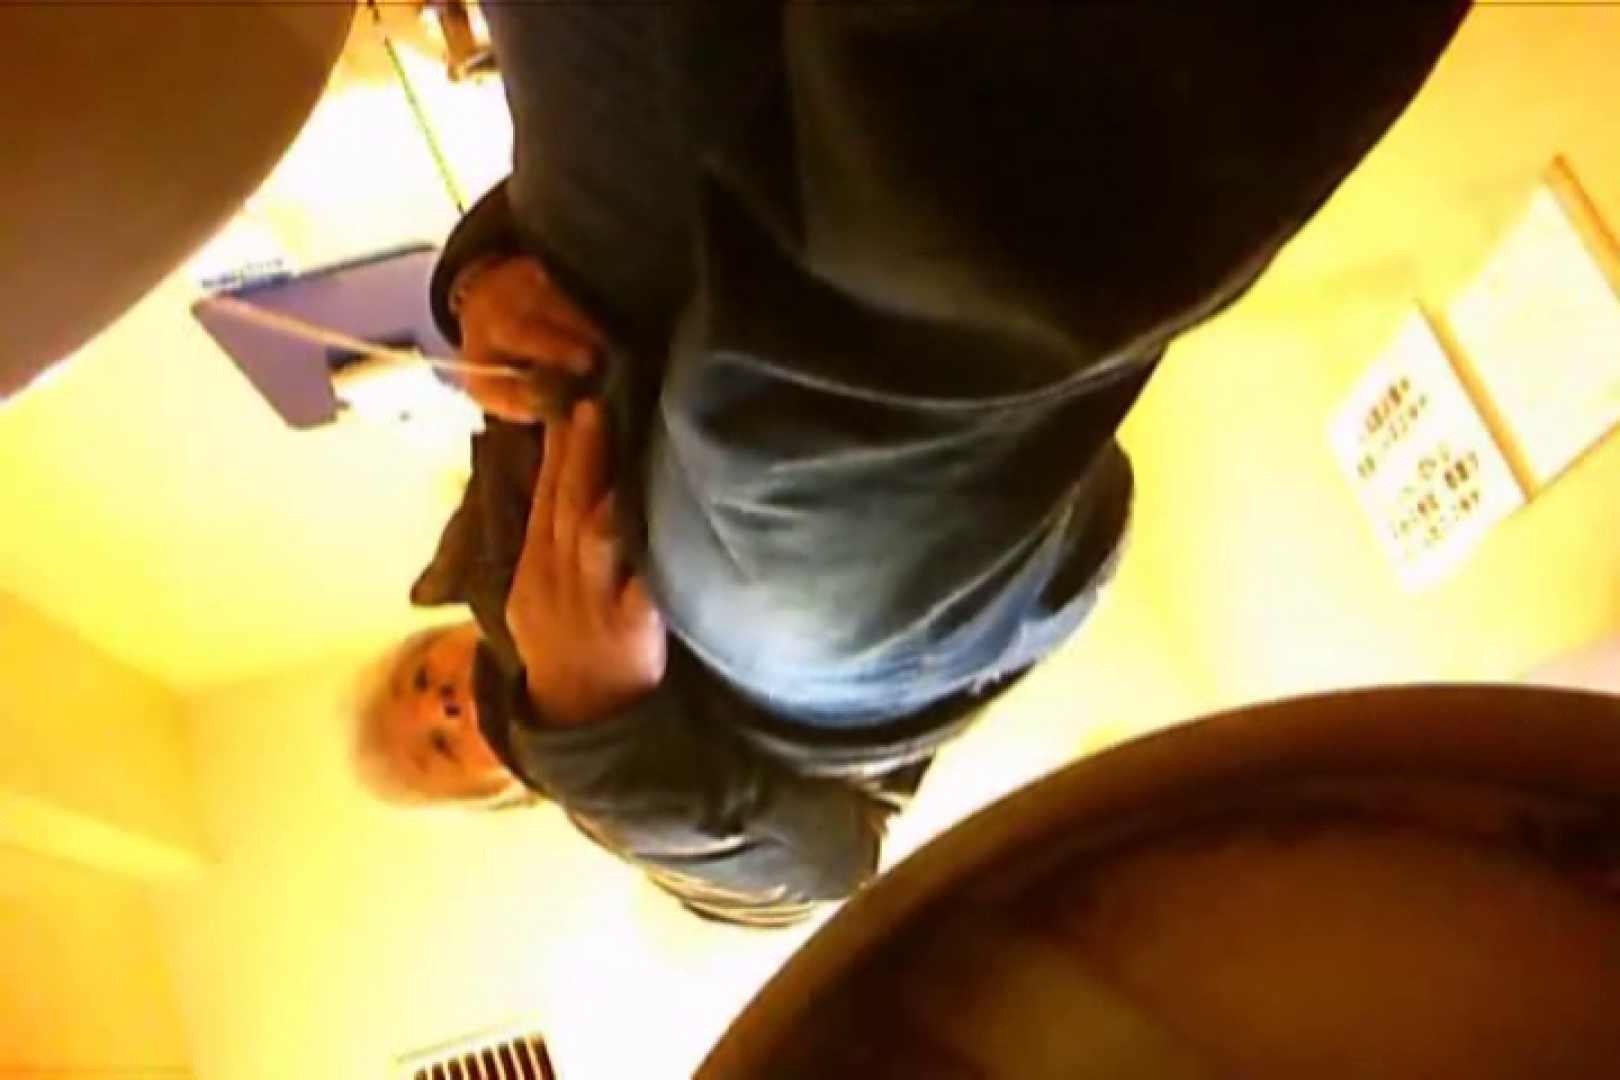 SEASON 2ND!掴み取りさんの洗面所覗き!in新幹線!VOL.13 リーマン系ボーイズ | 人気シリーズ  80pic 2